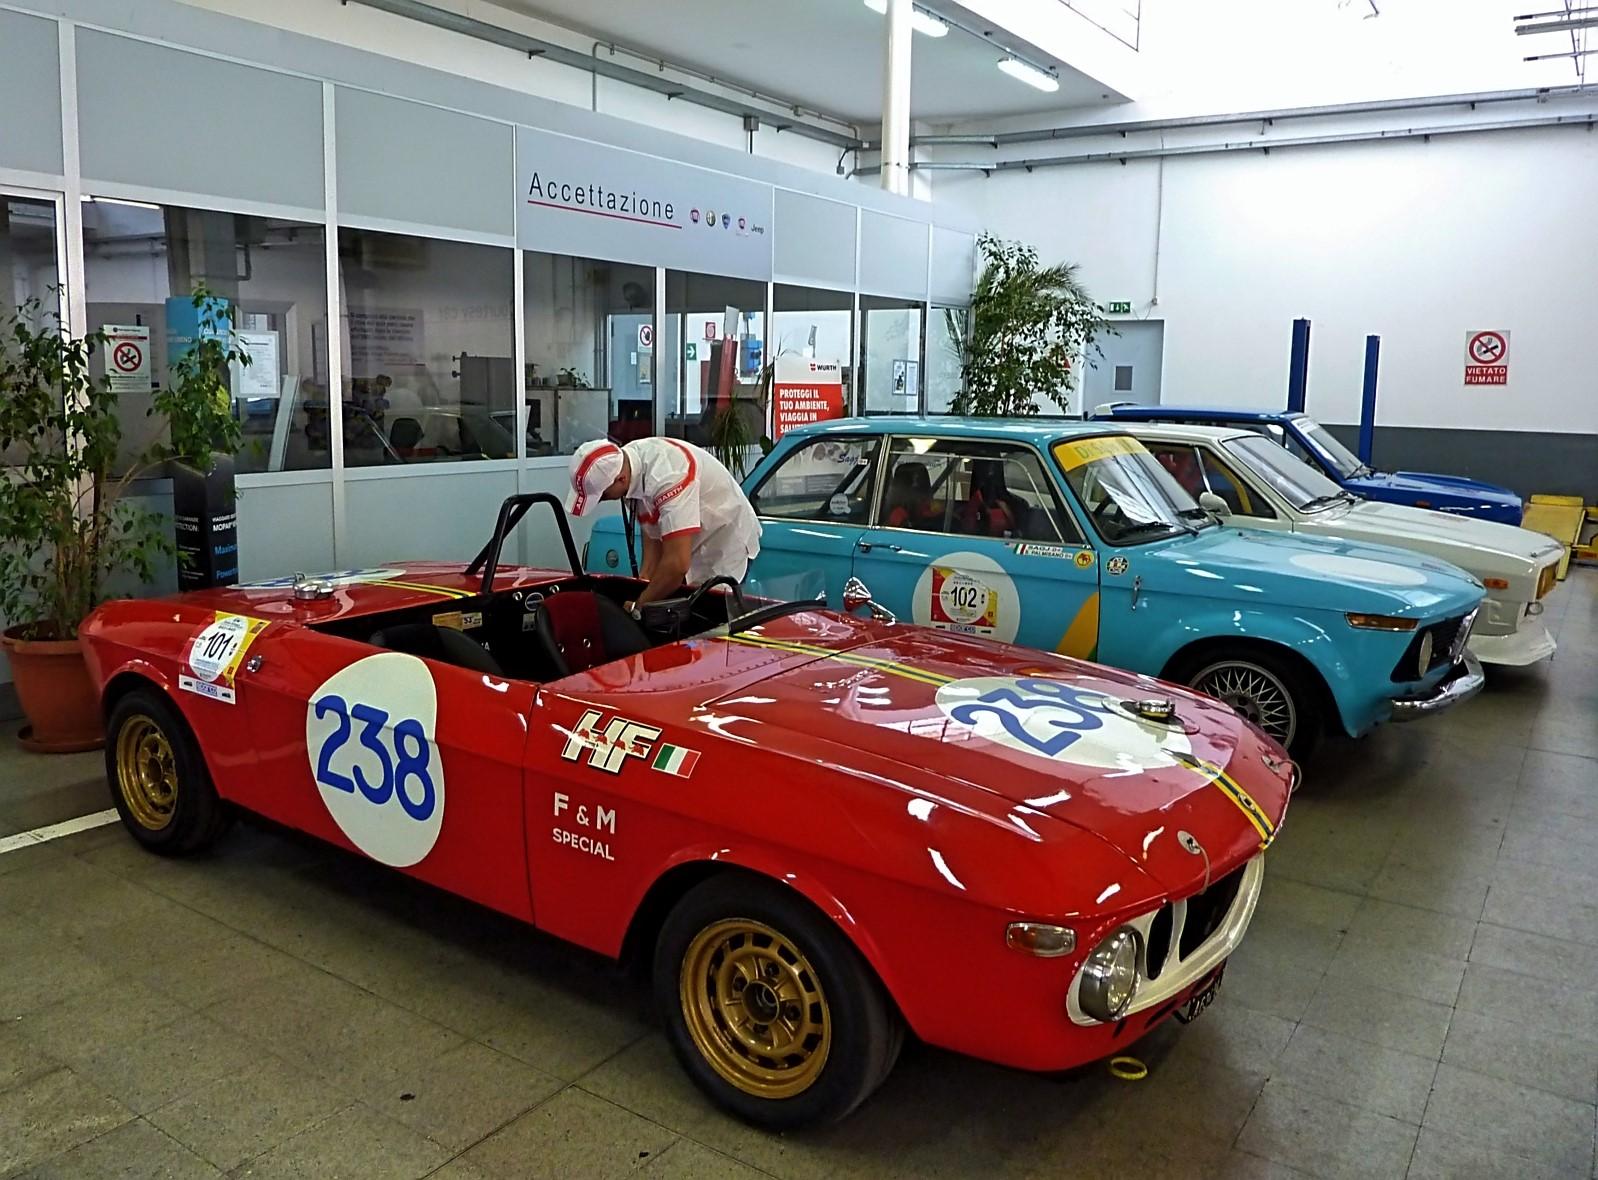 1969 Lancia Fulvia HF Barchetta F&M (Sandro  Munari) (25)